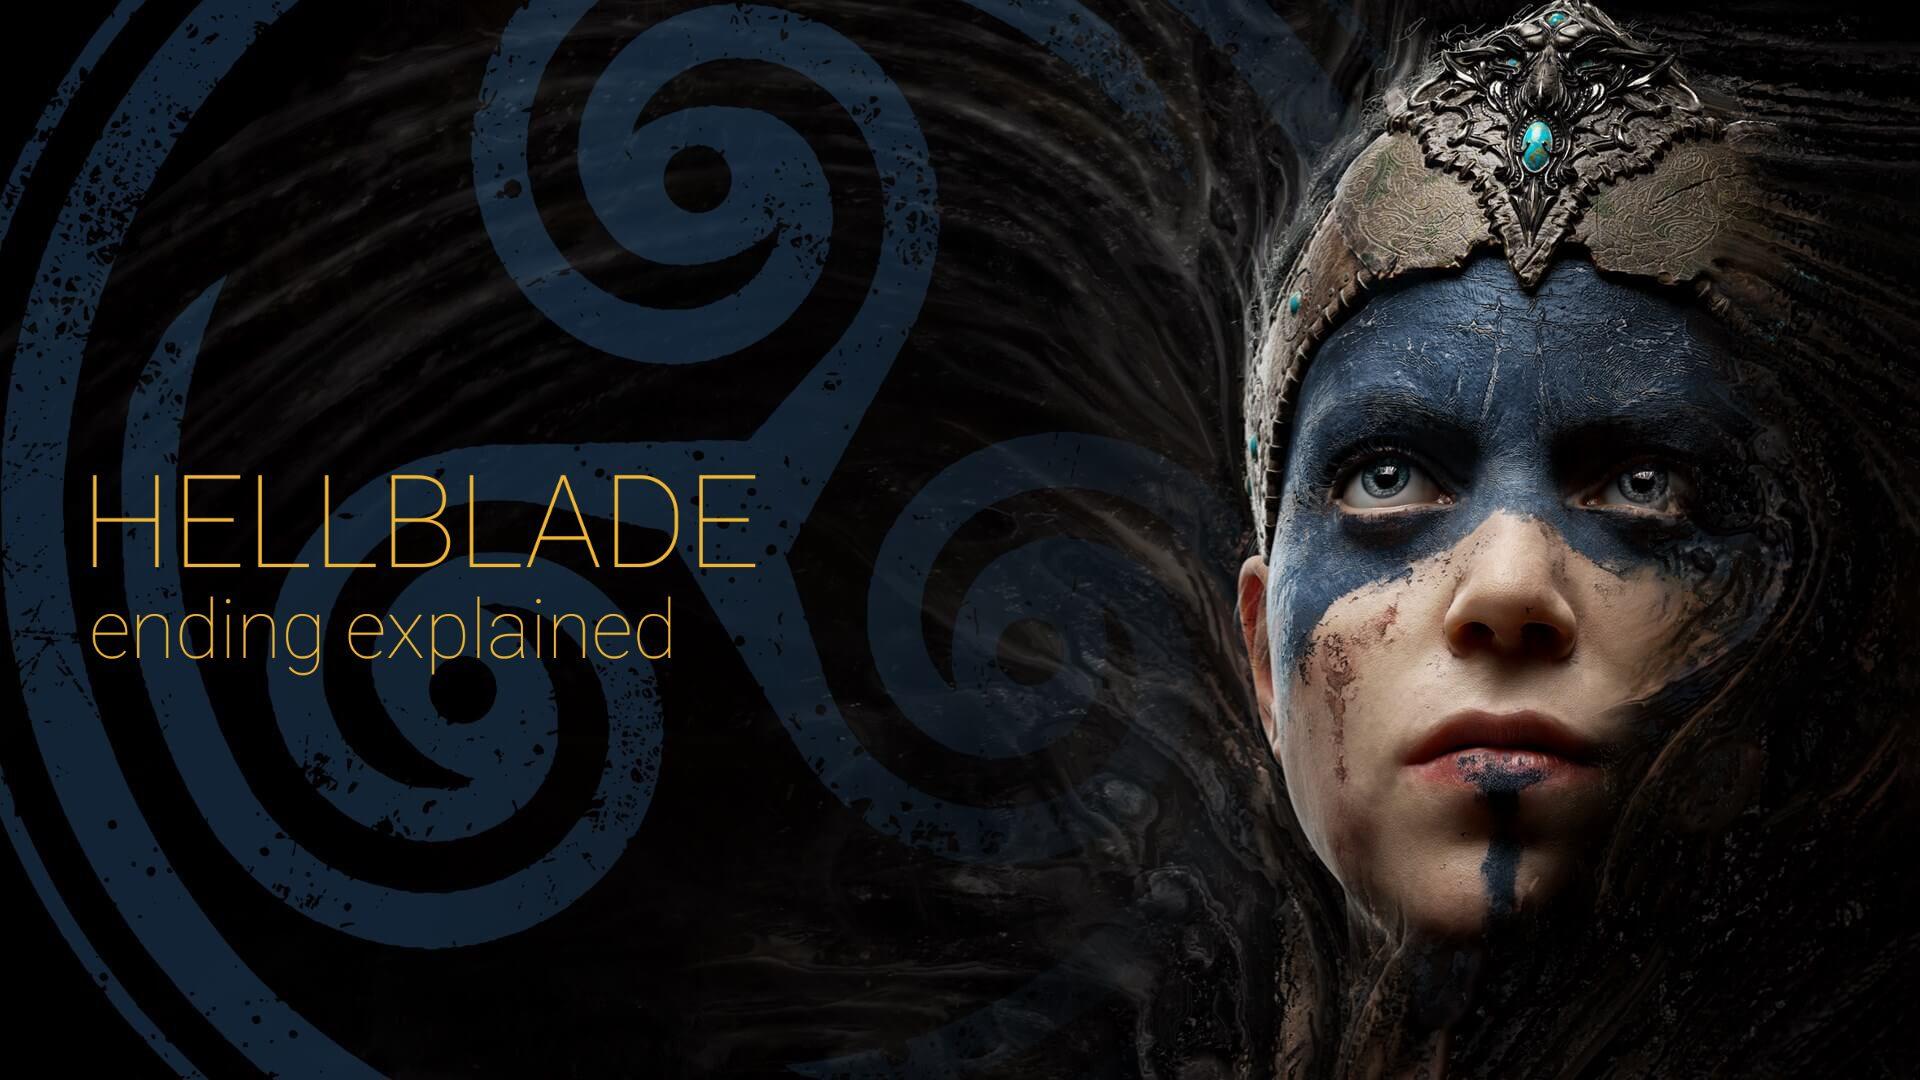 Hellblade: Senua's Sacrifice Ending Explained